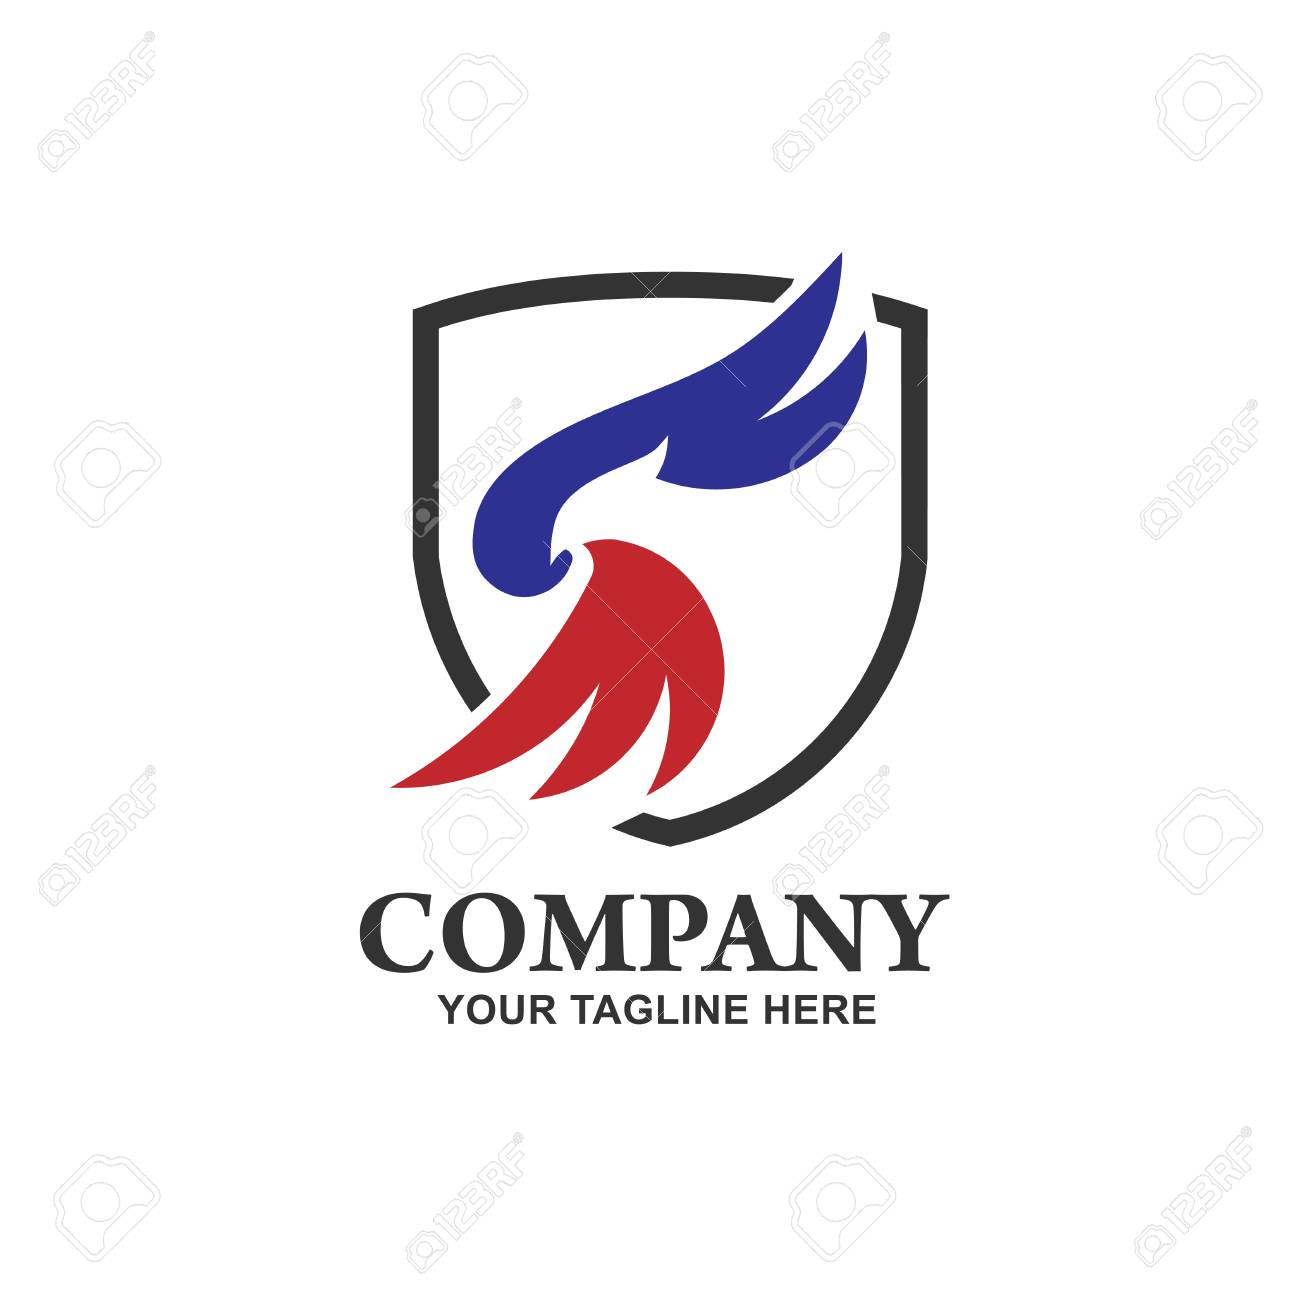 Eagle head with shield logo Template, Hawk mascot graphic, creative